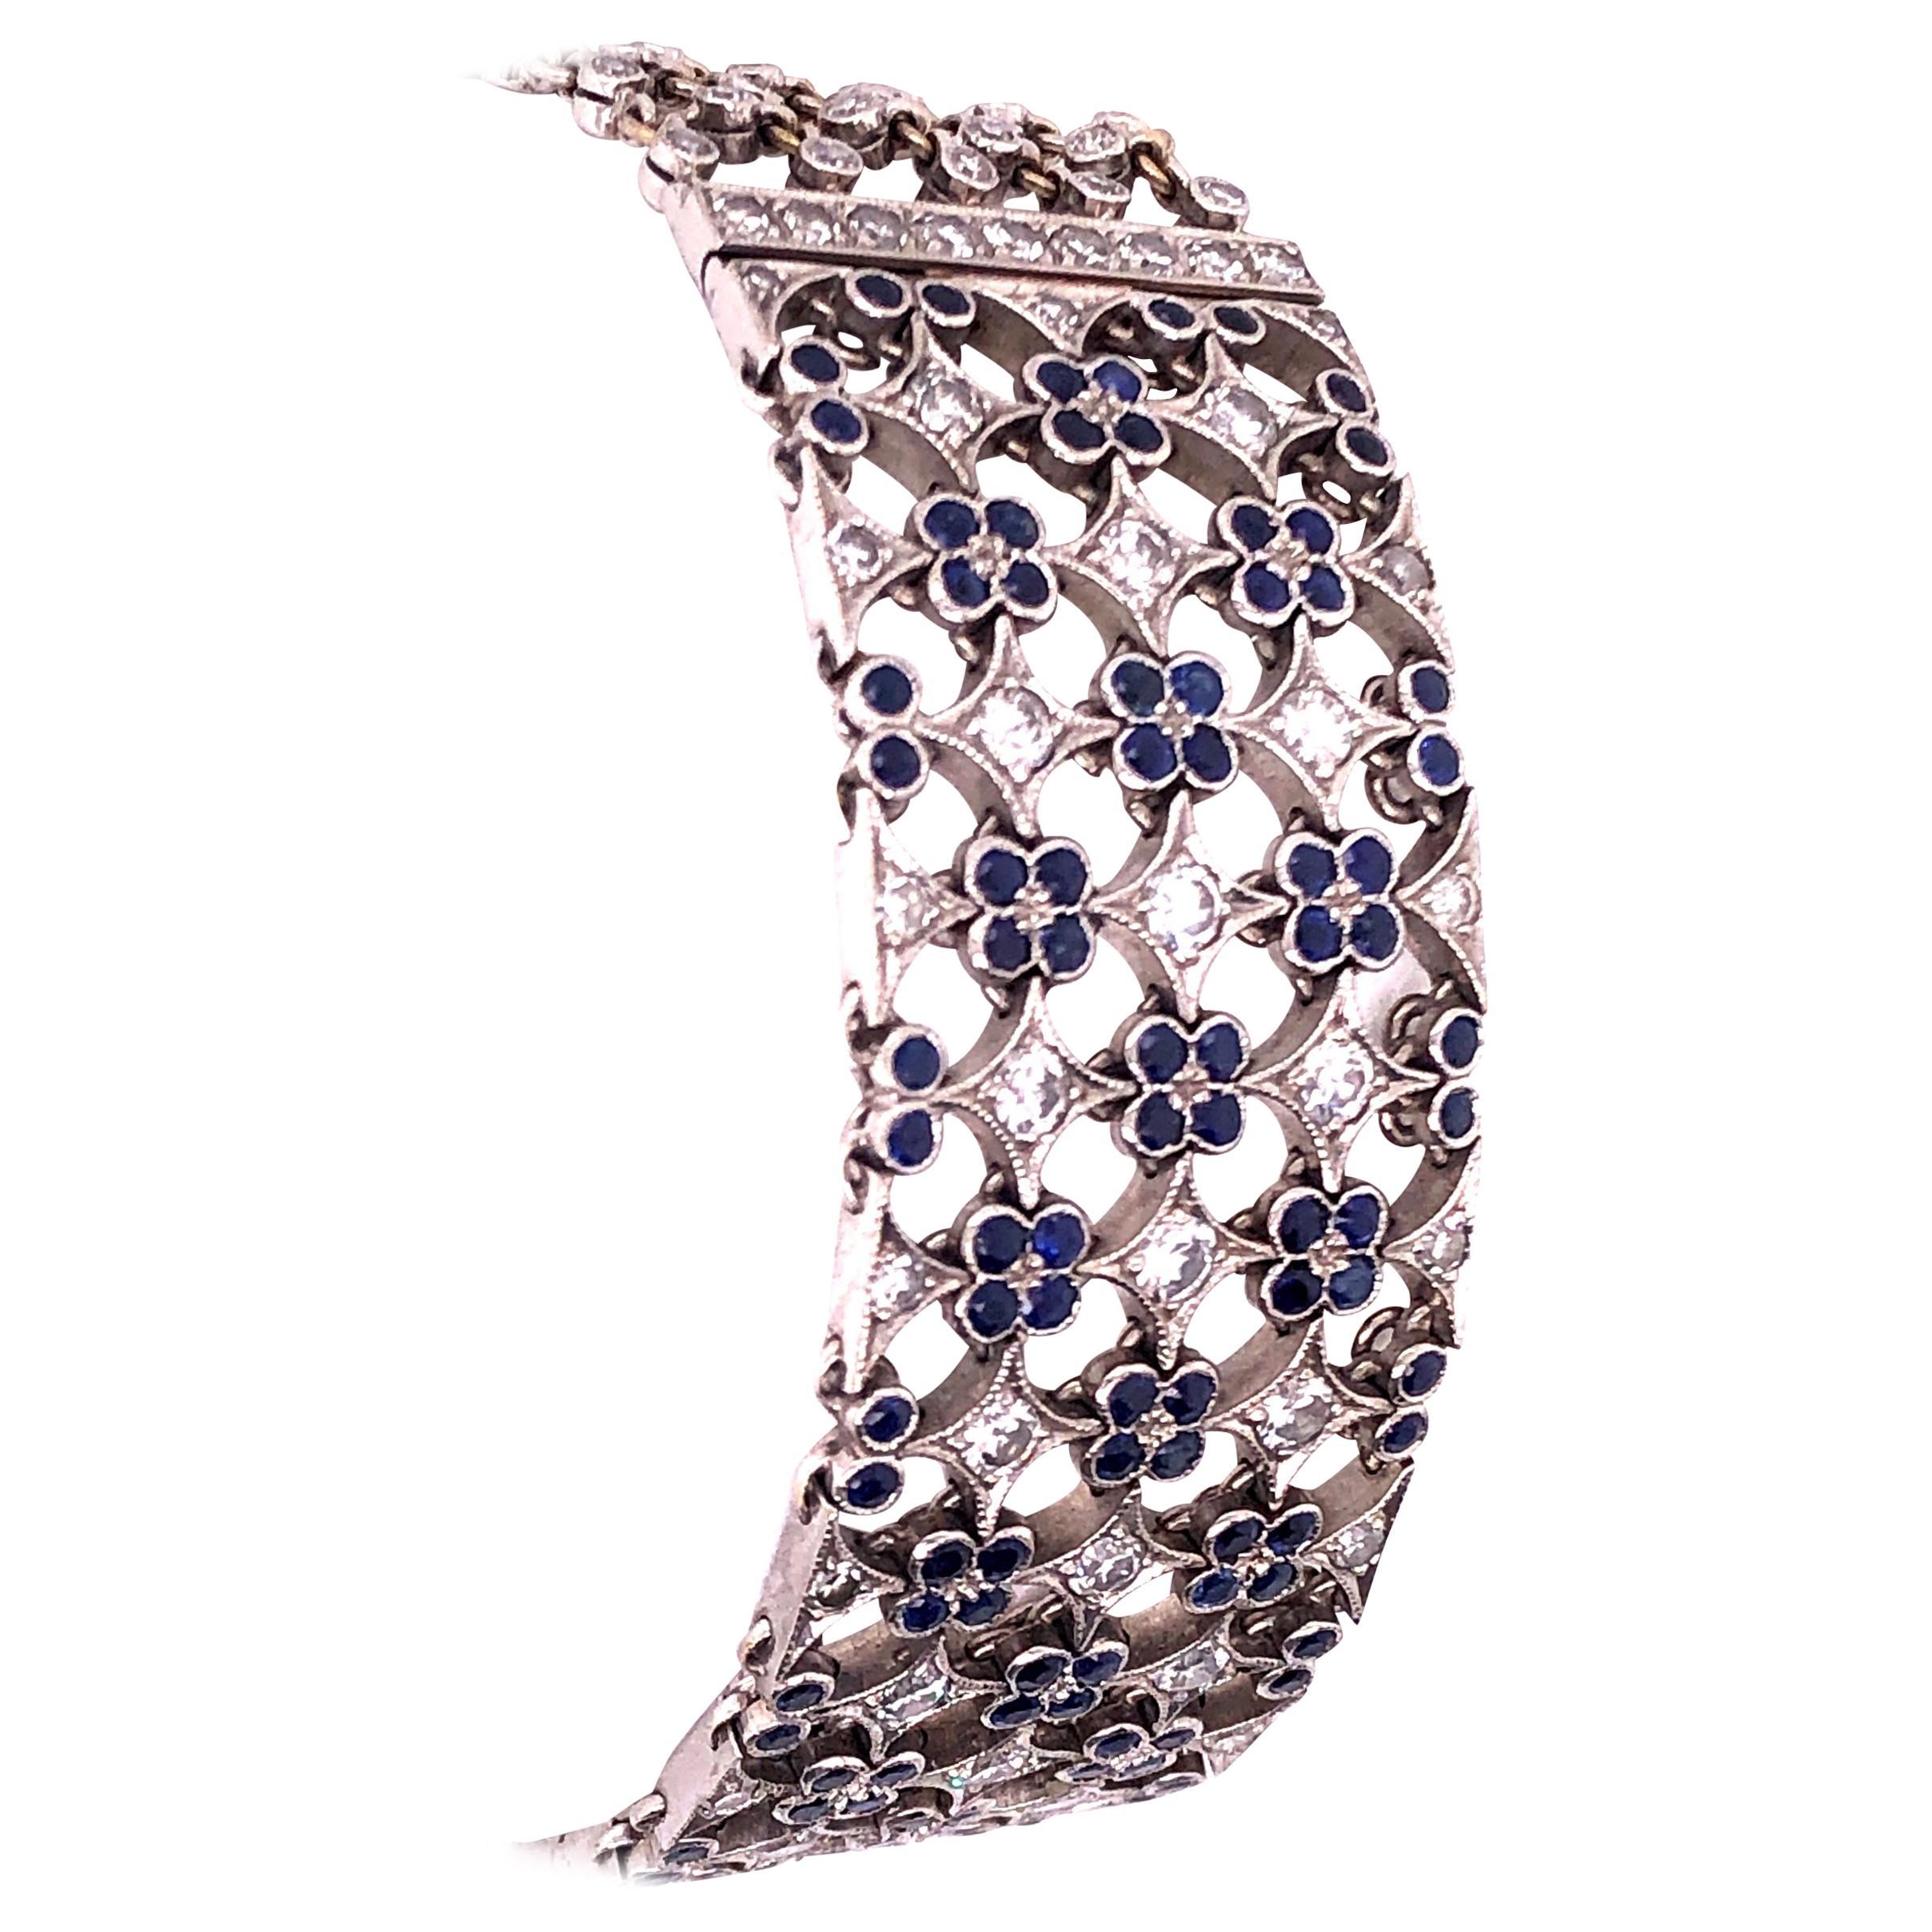 18 Karat White Gold Mesh Sapphire and Diamond Lace Bracelet